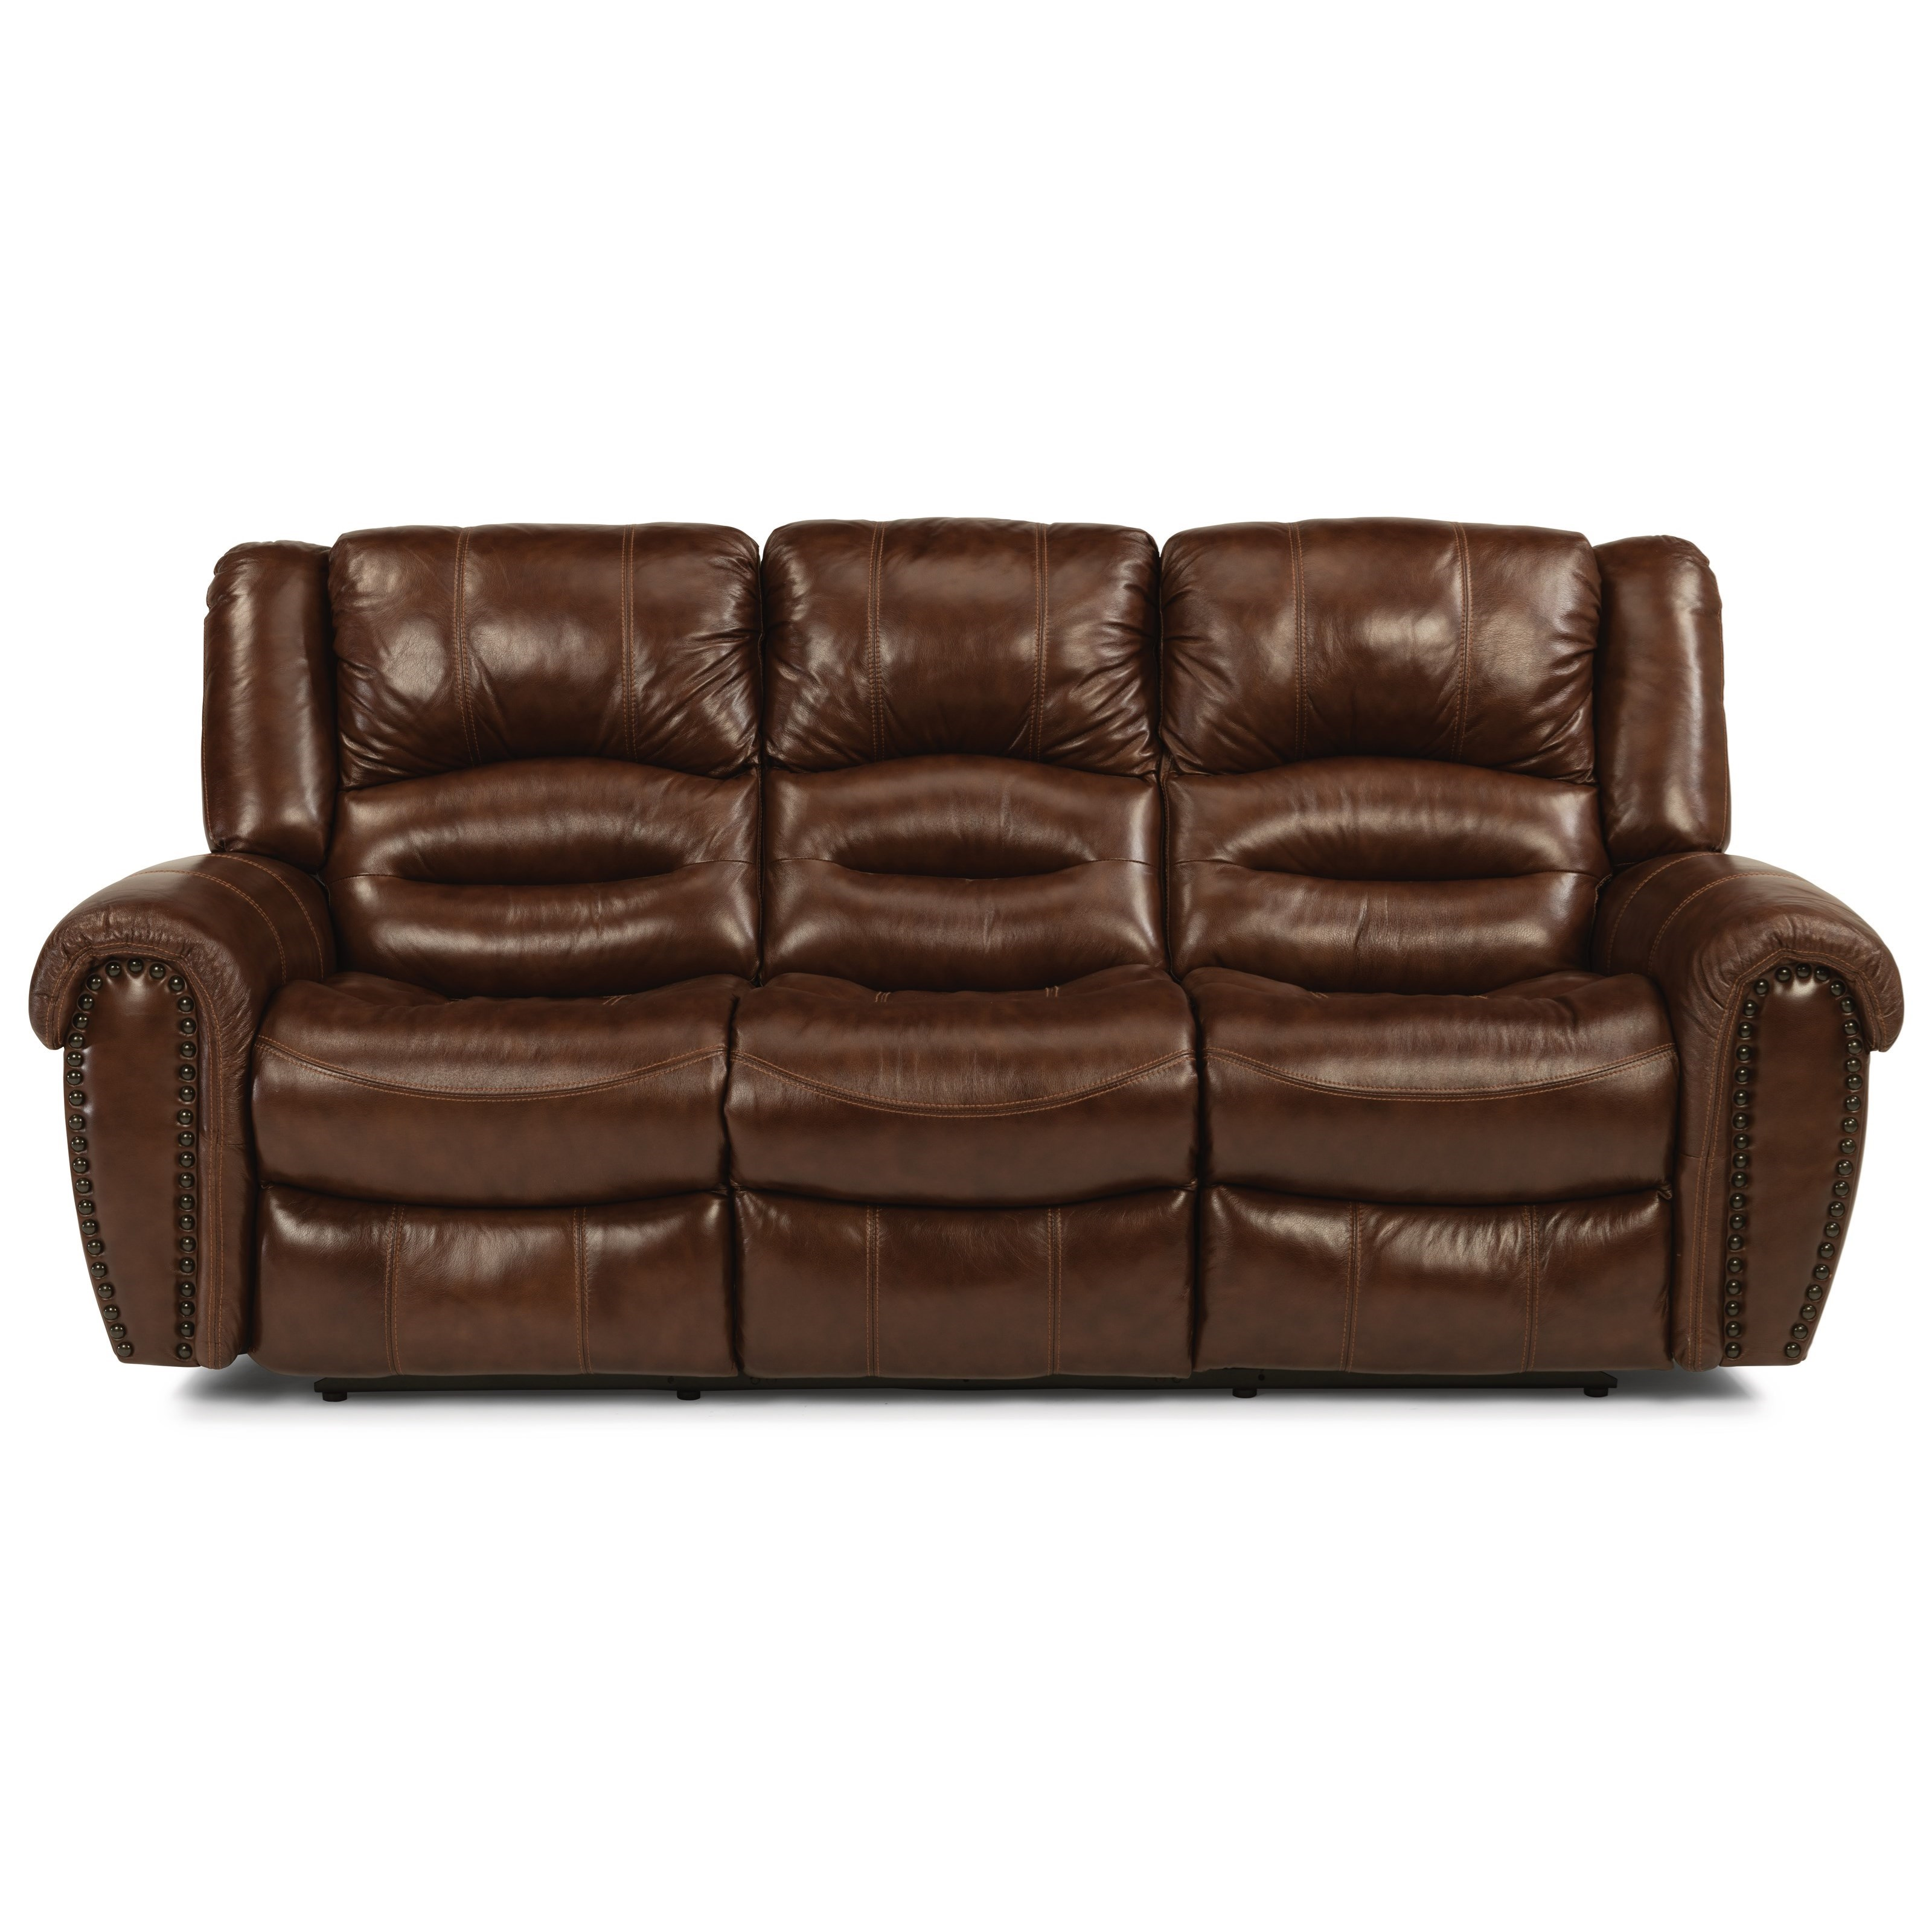 Latitudes - Town Reclining Sofa by Flexsteel at Johnny Janosik